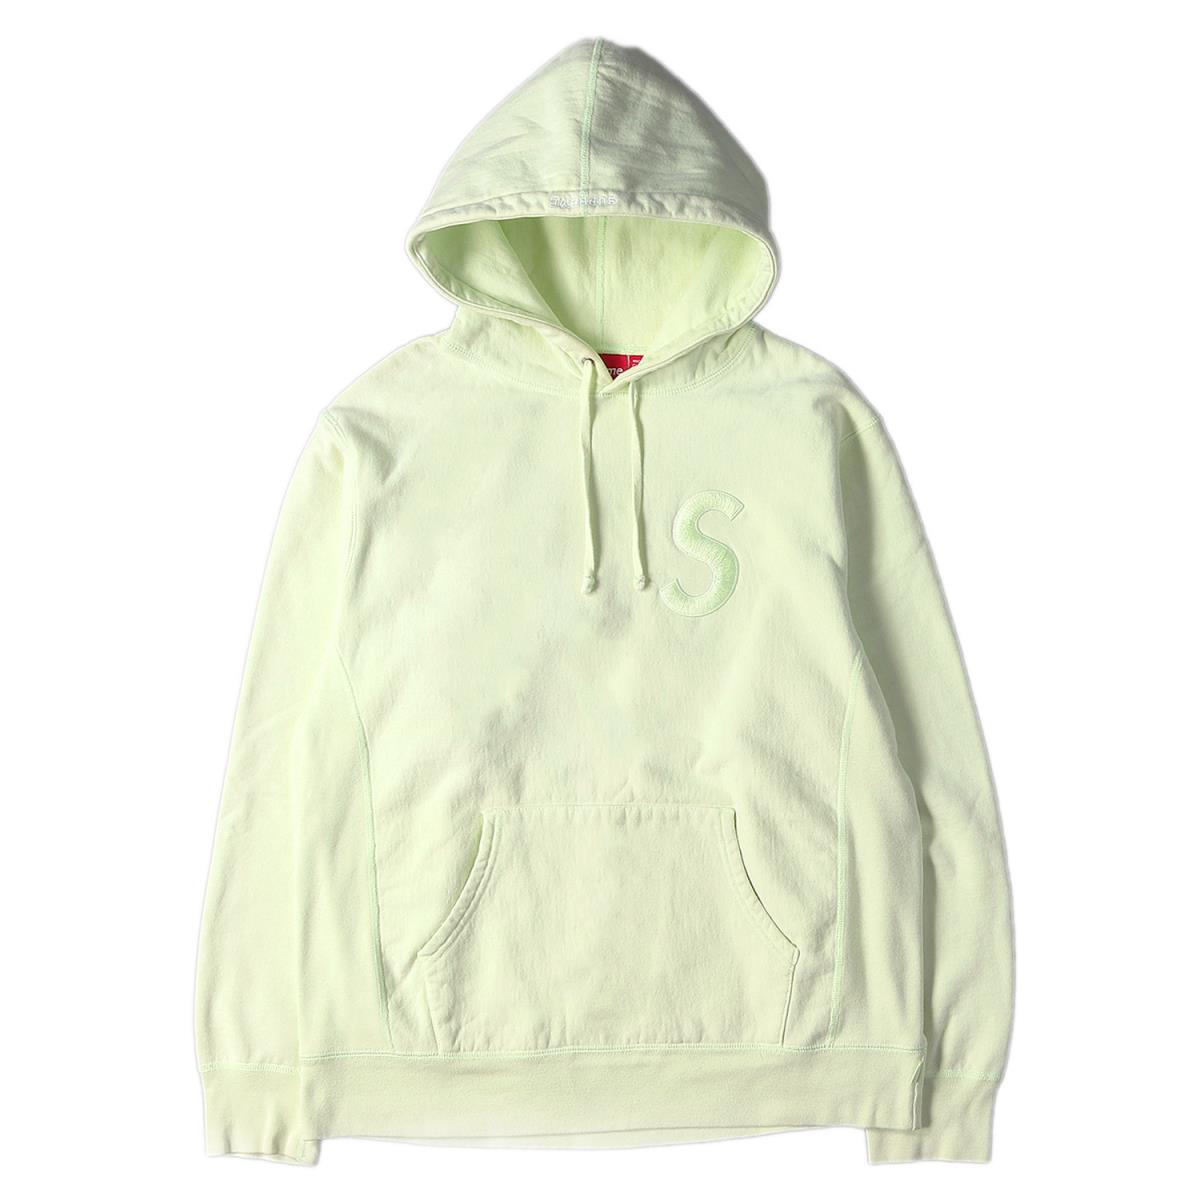 Supreme (シュプリーム) パーカー 17AW Sロゴ 刺繍 スウェット パーカー Tonal S Logo Hooded Sweatshirt ペールライム L 【メンズ】【中古】【K2541】【あす楽☆対応可】